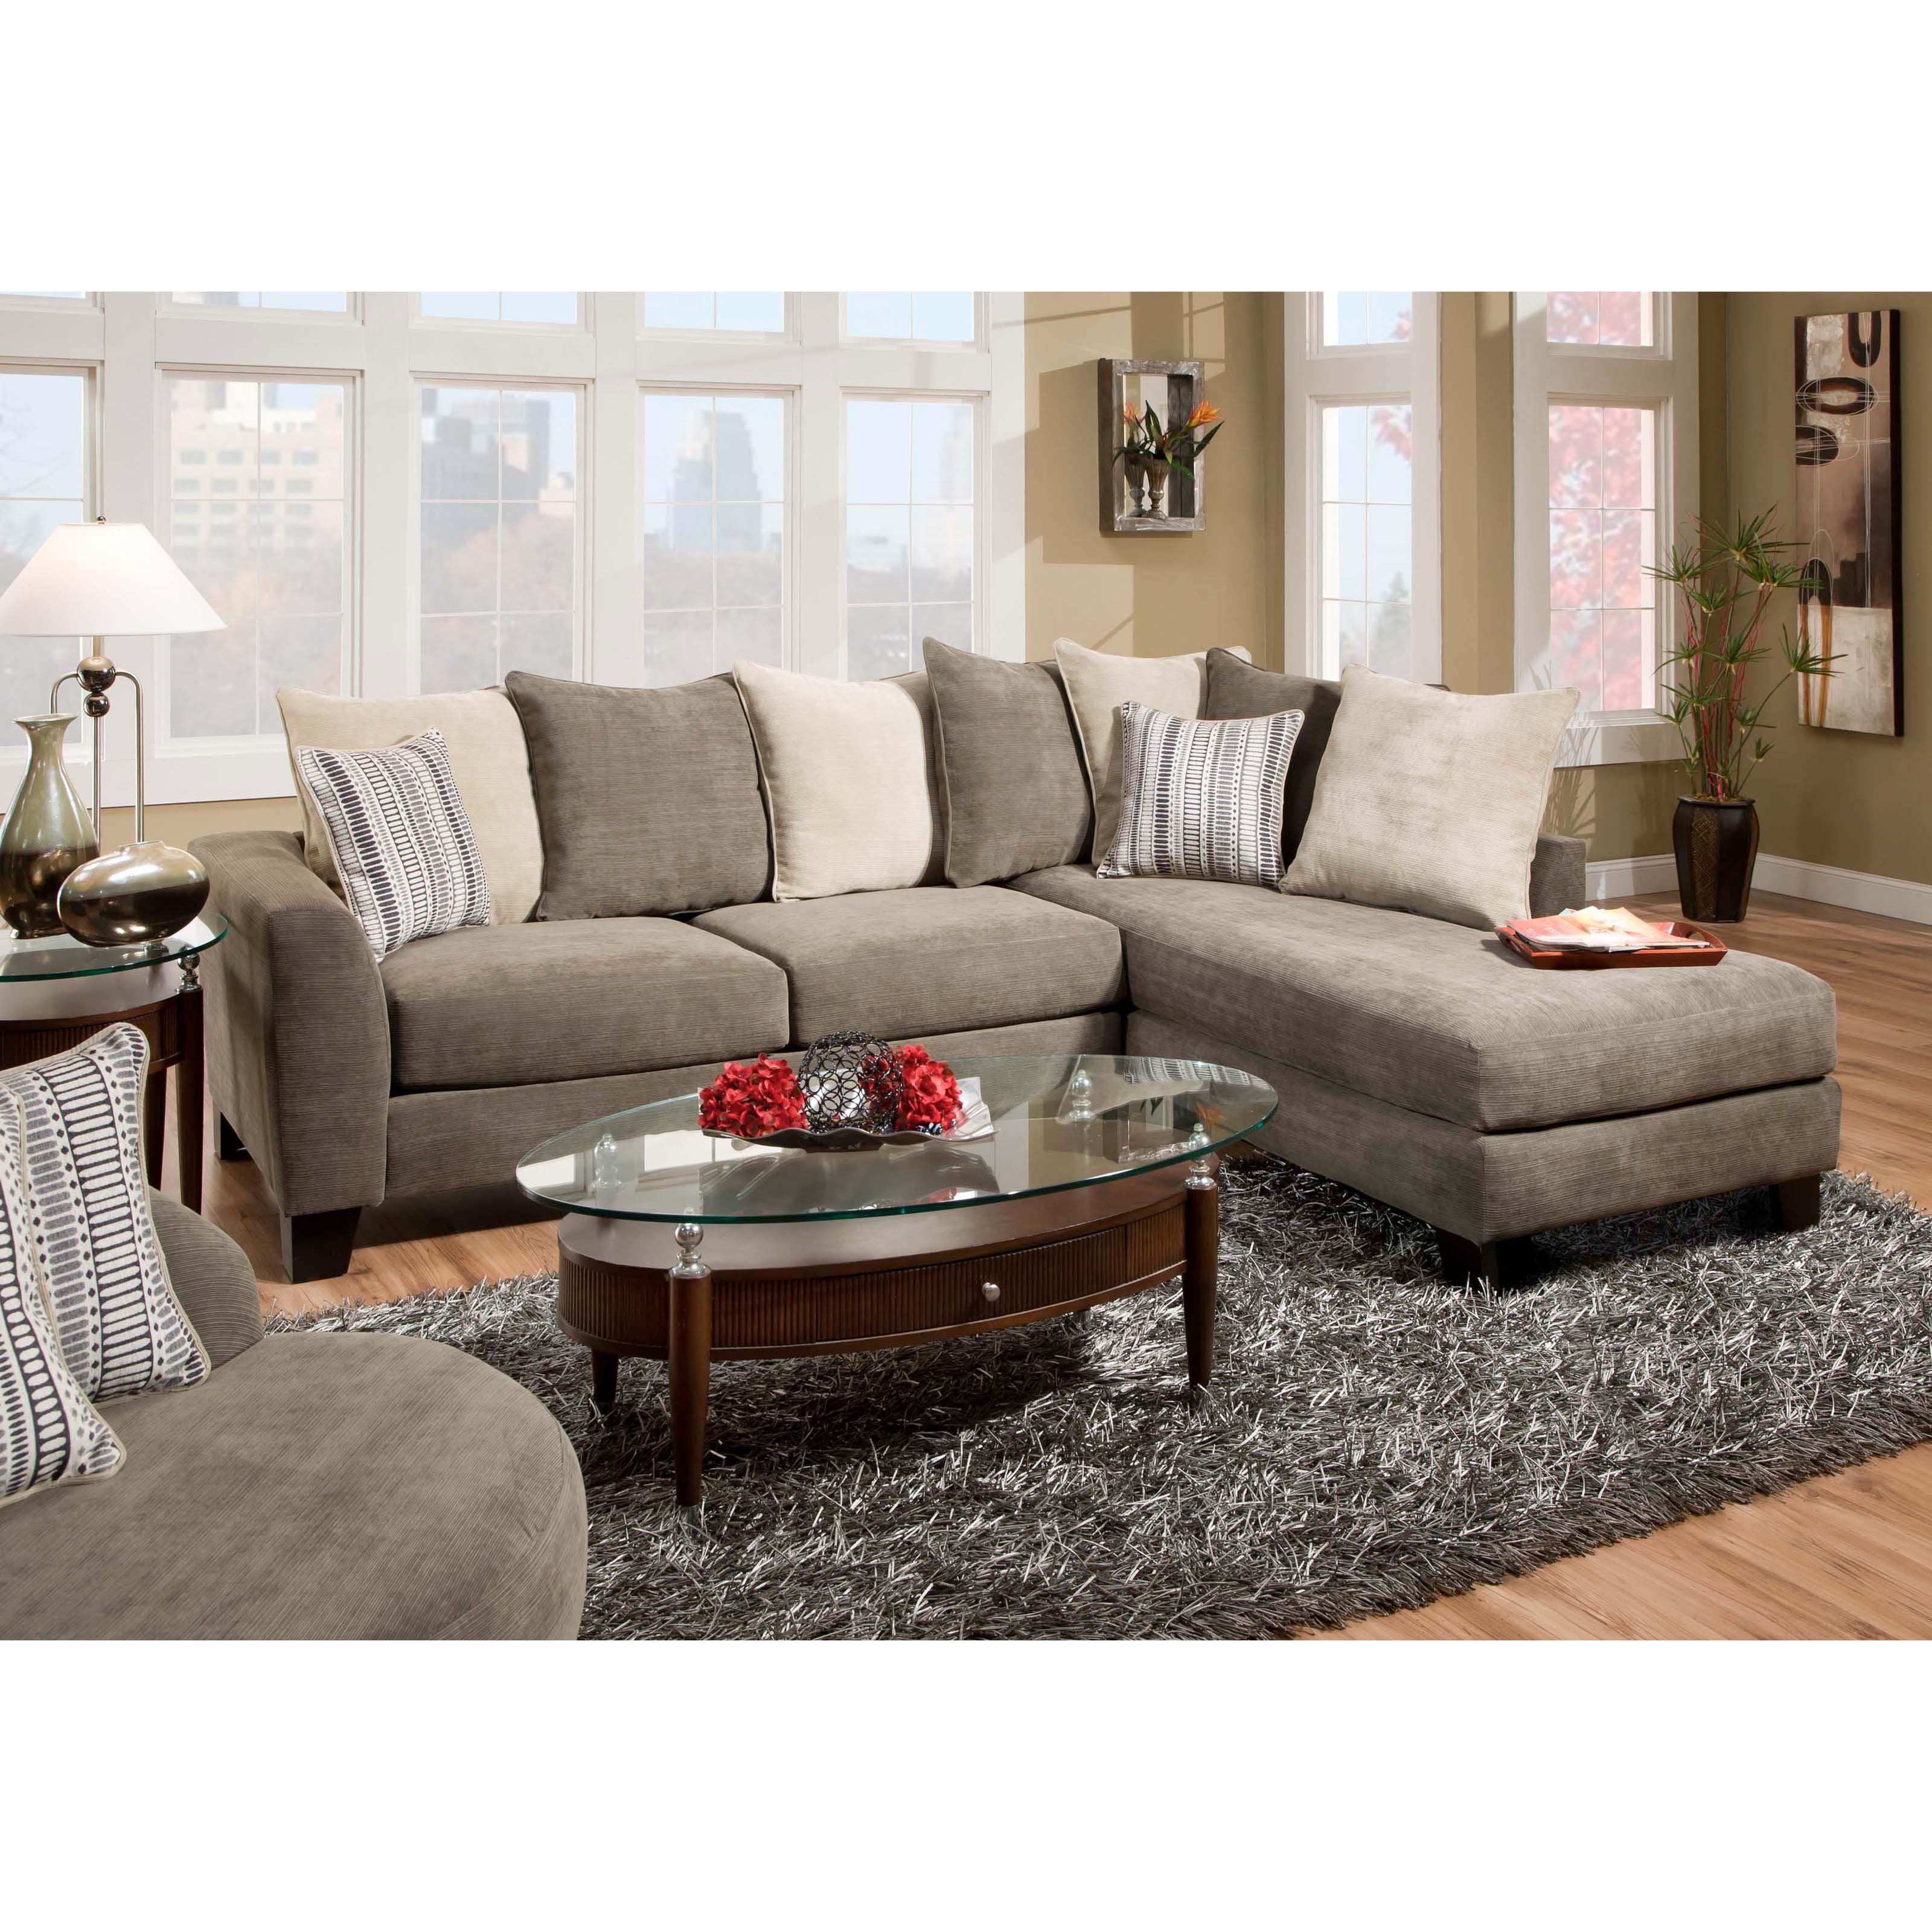 Chelsea Home Sheridan Upholstered 2 Piece Sectional Sofa Walmart